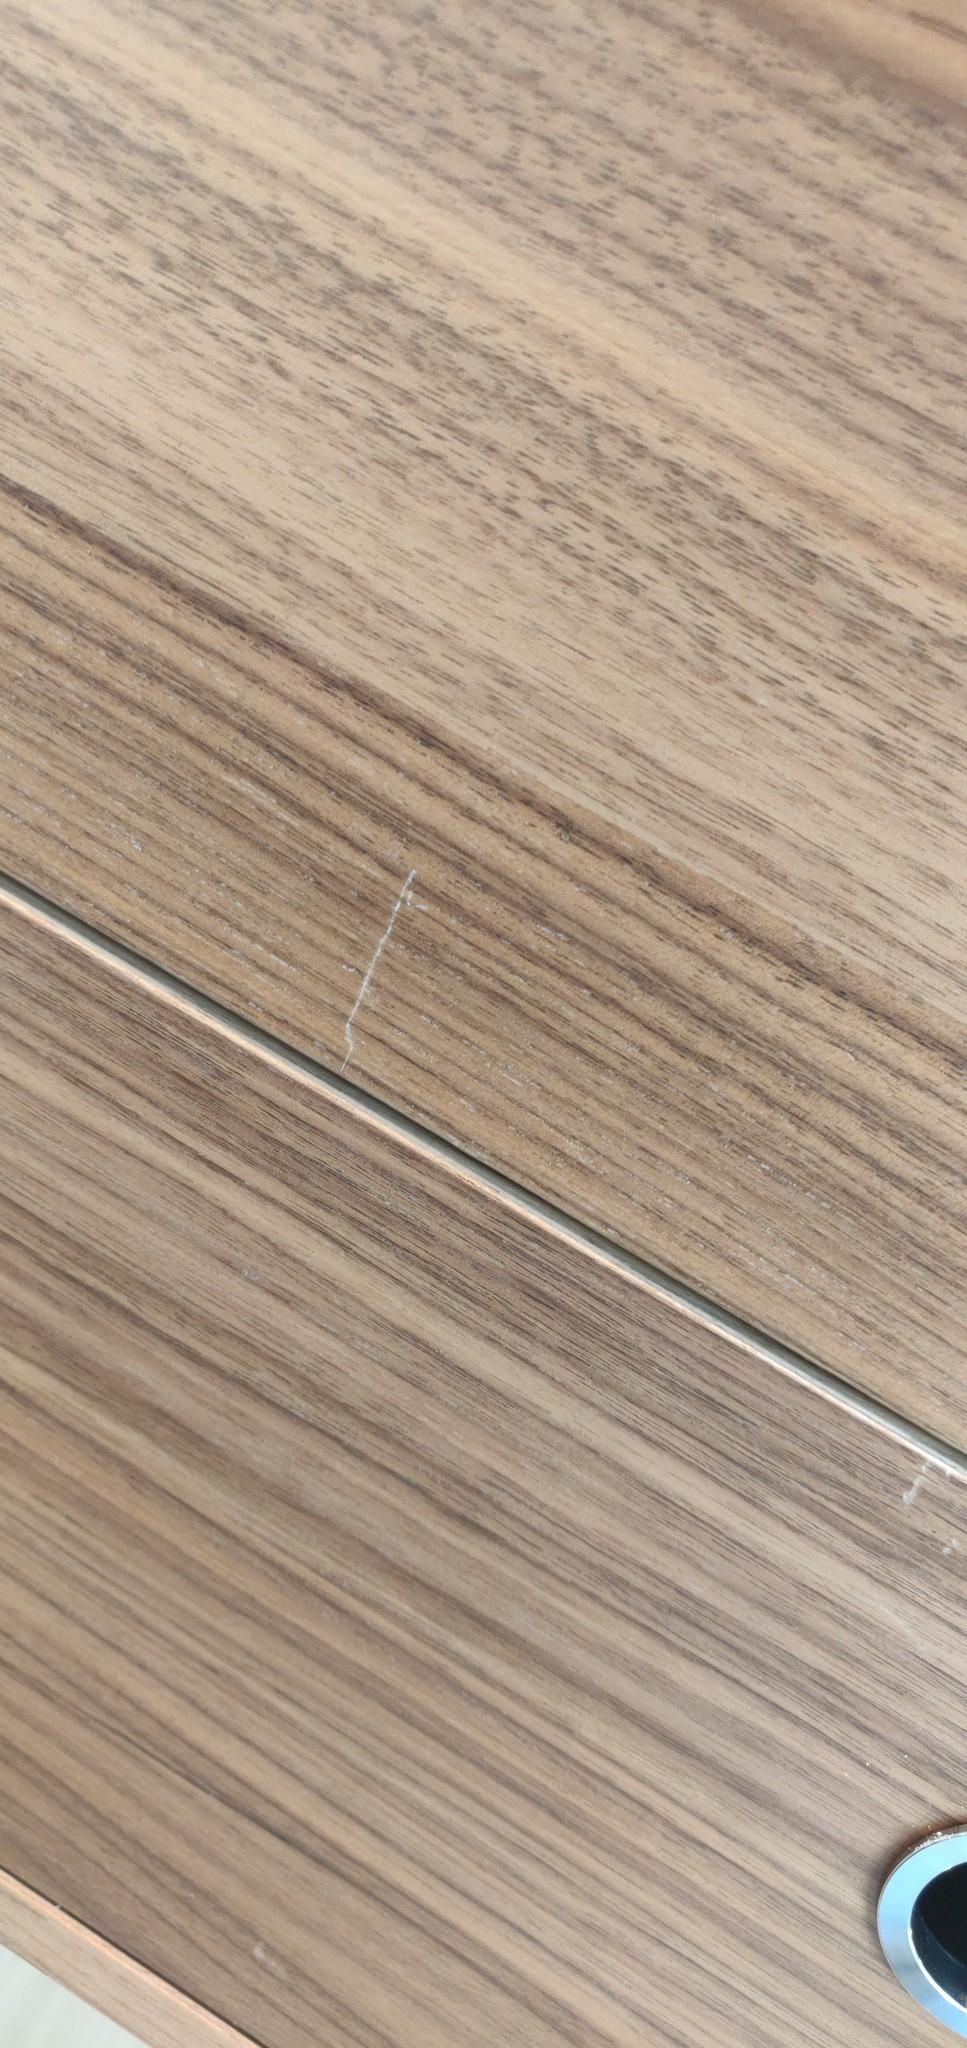 Toonzaalmodel String opstelling walnut / brown-5